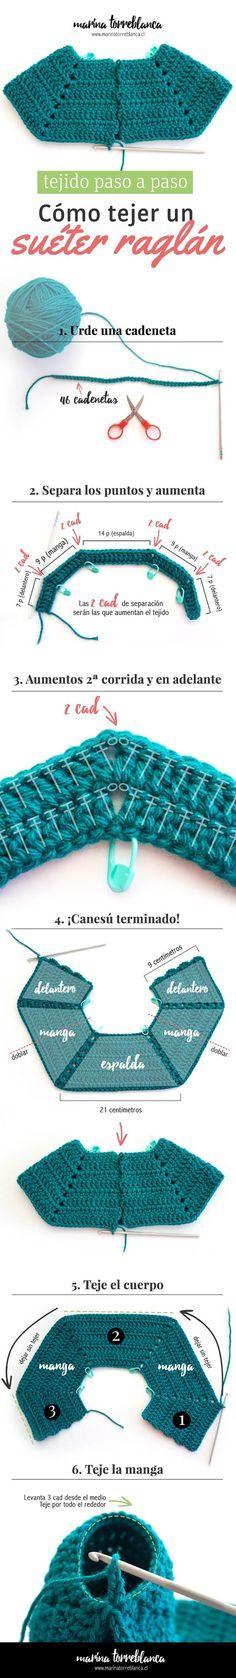 18 mejores imágenes de Patrones | Crochet patterns, Crochet clothes ...